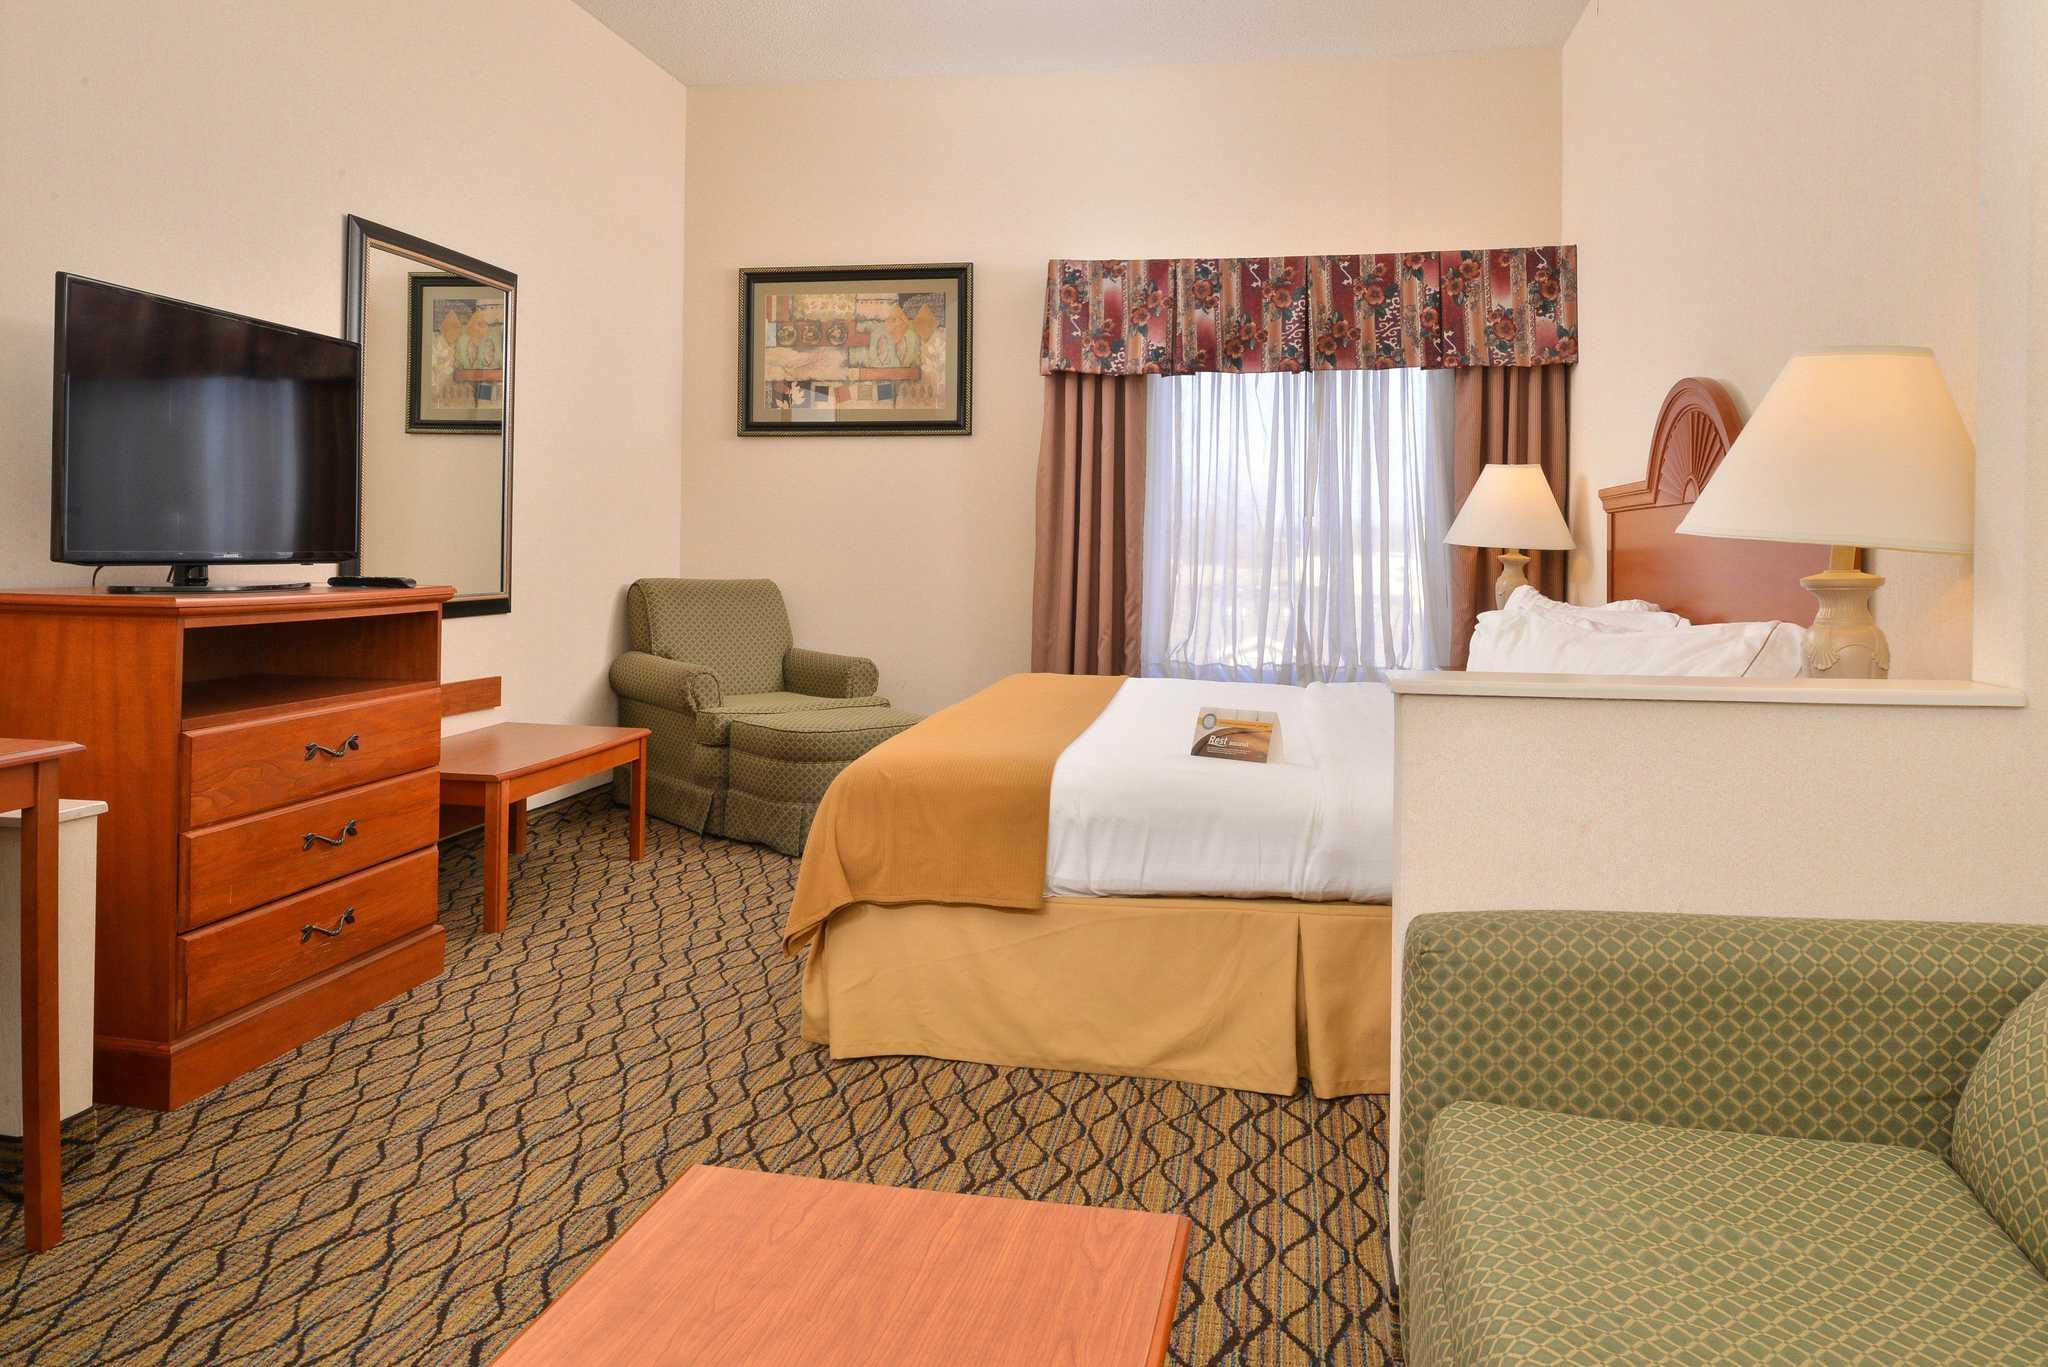 Quality Inn & Suites Jefferson City image 10